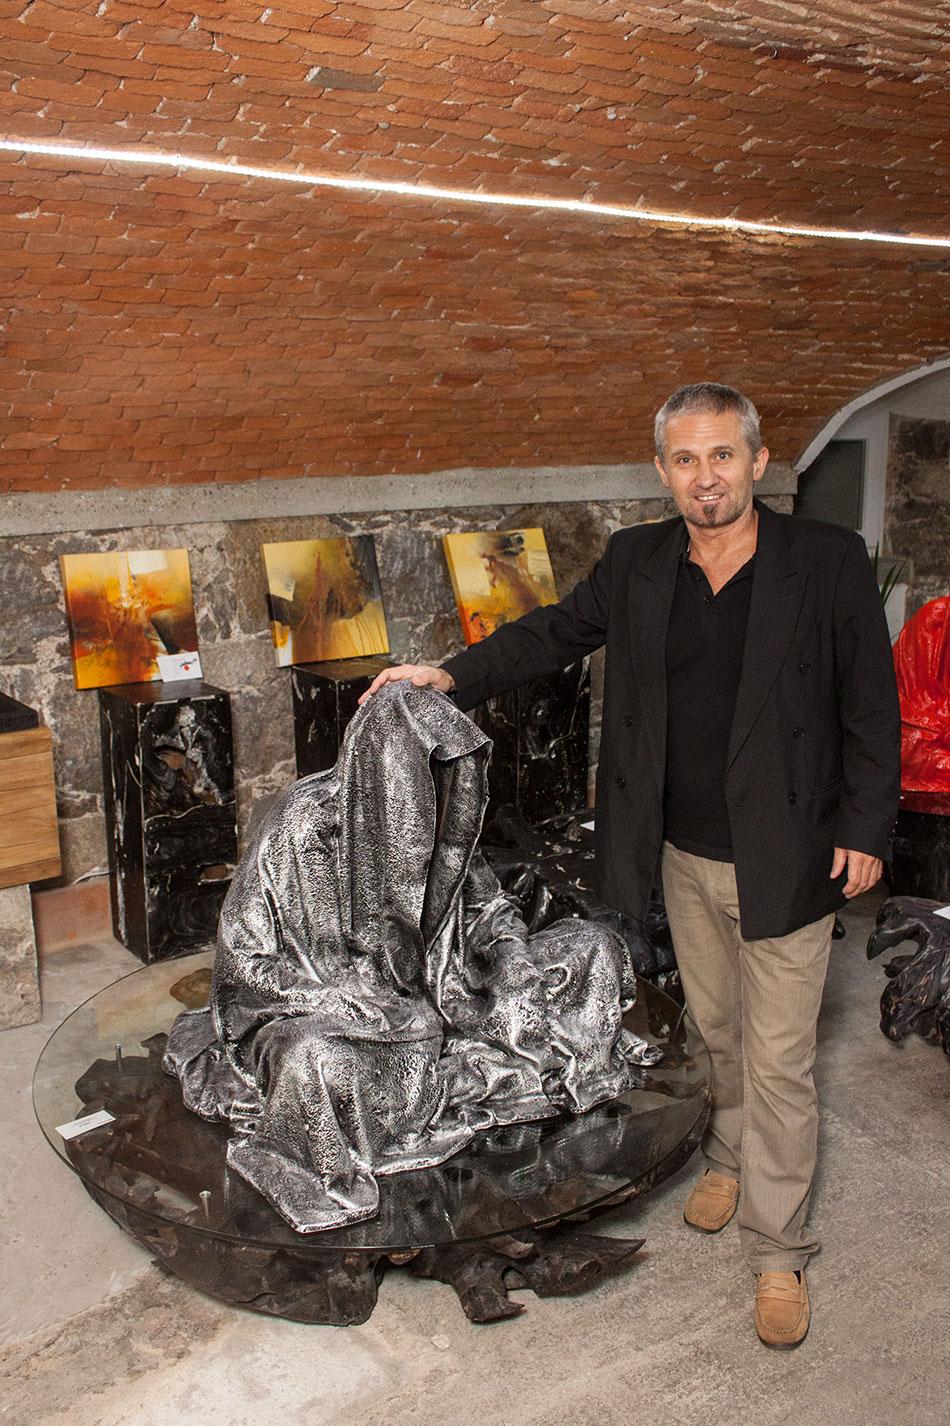 mobile-galerie-gall-toko06-linz-25er-turm-guardians-of-time-manfred-kielnhofer-contemporary-fine-art-design-sculpture-2666